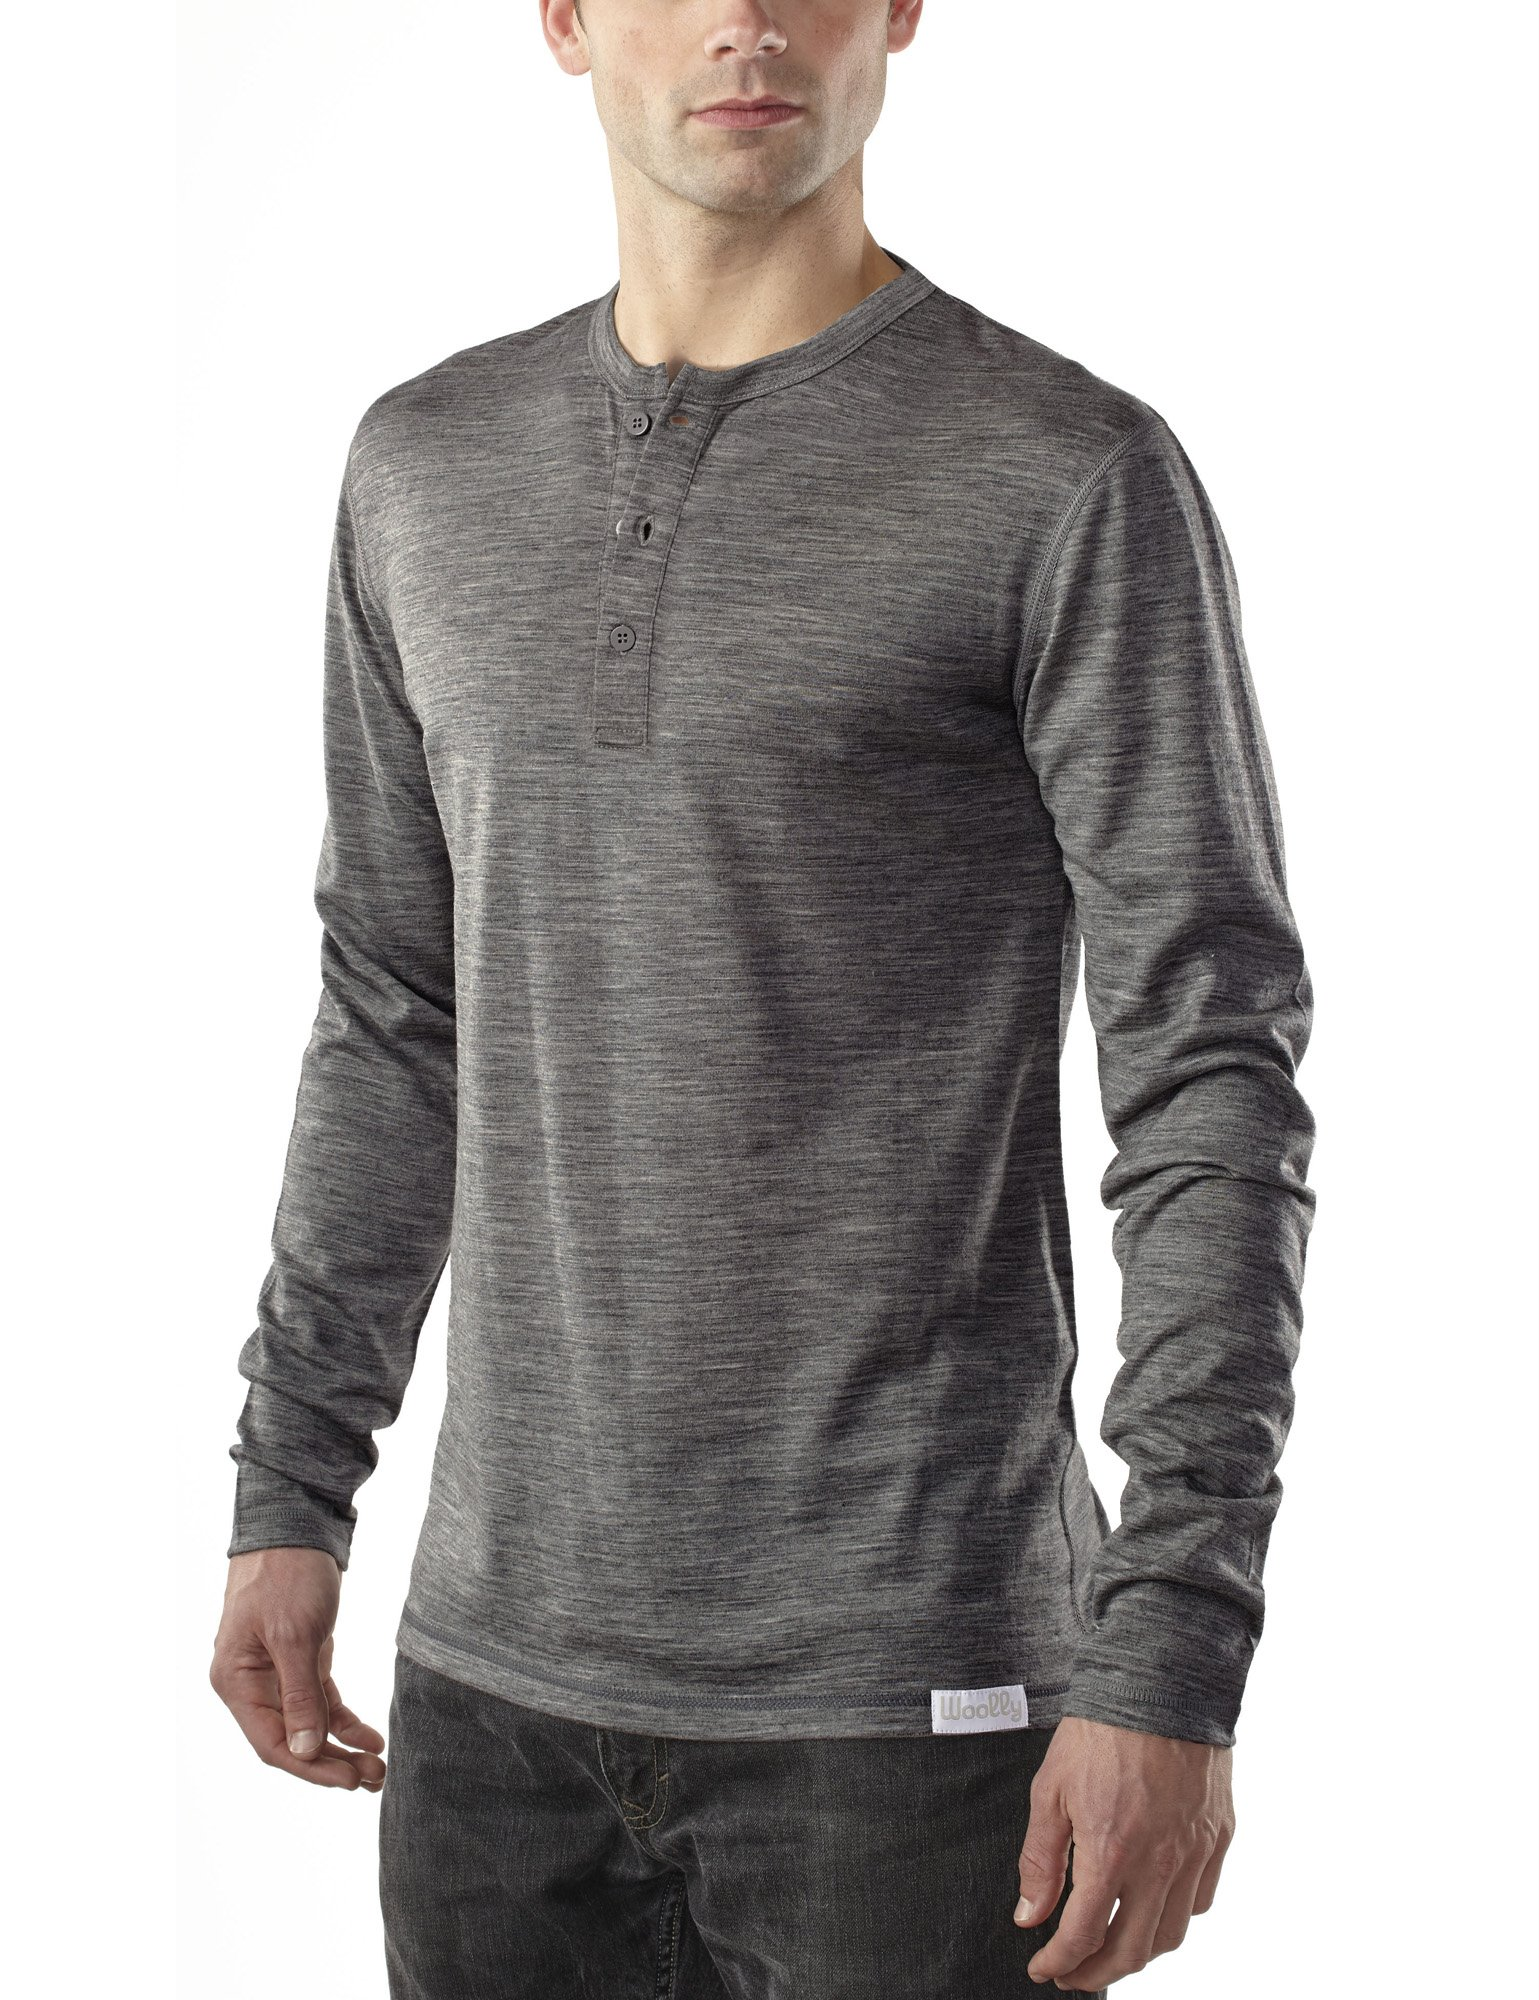 Woolly Clothing Men's Merino Long Sleeve Henley - Moisture Wicking, Anti-Odor, Casual Athletic wear M CHR